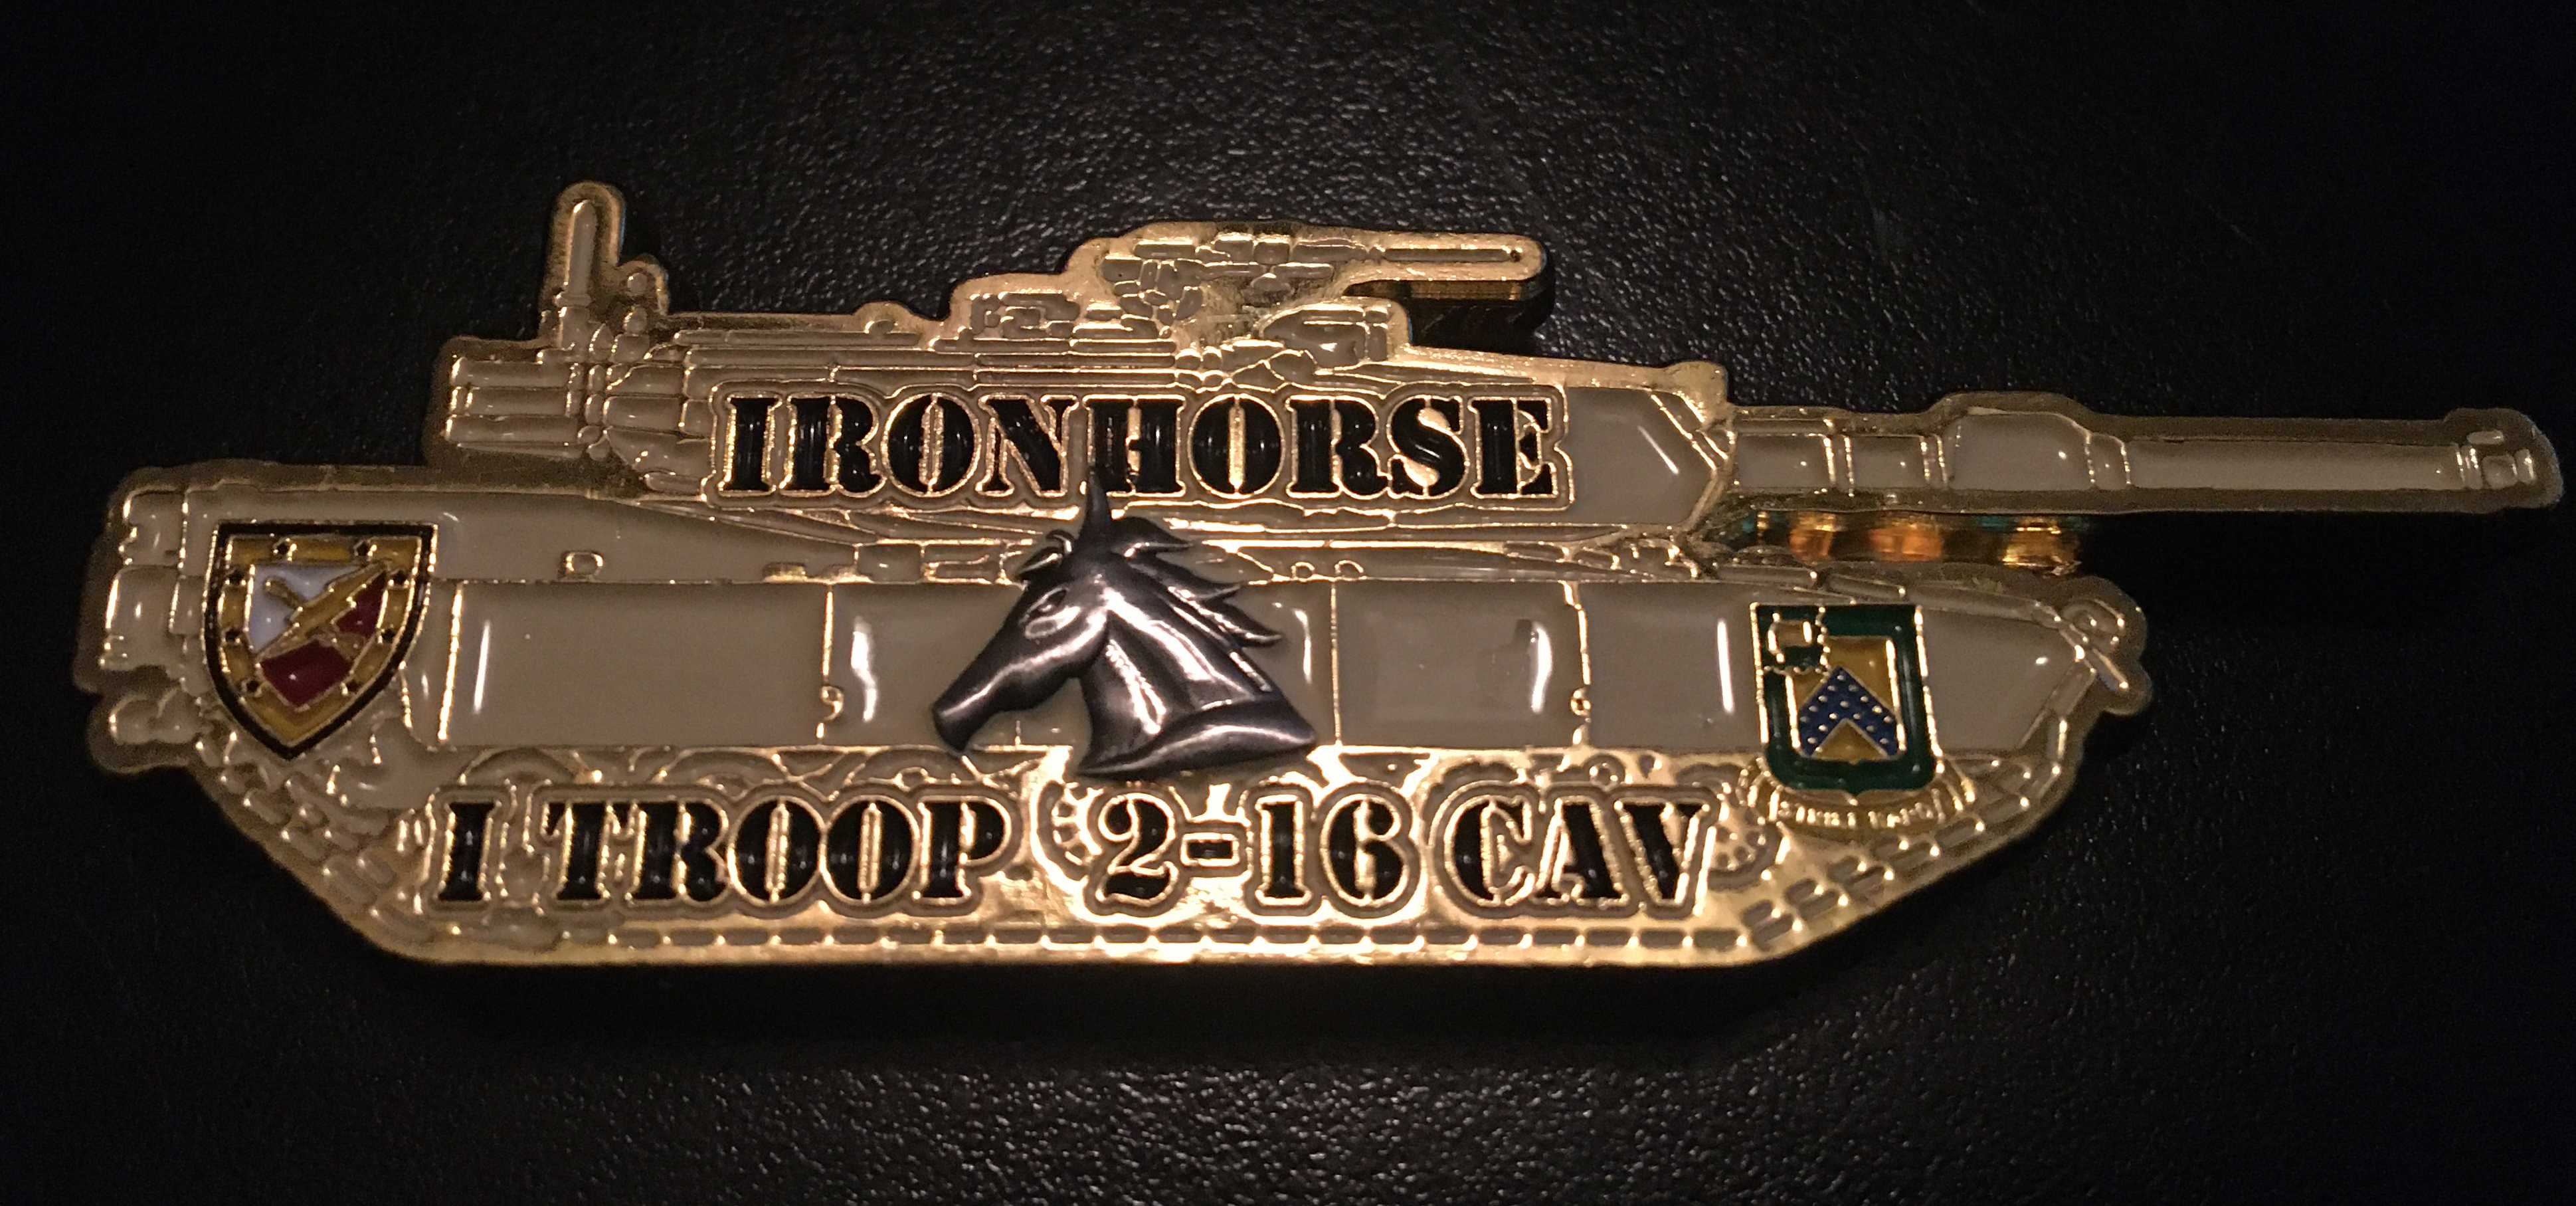 Ironhorse front